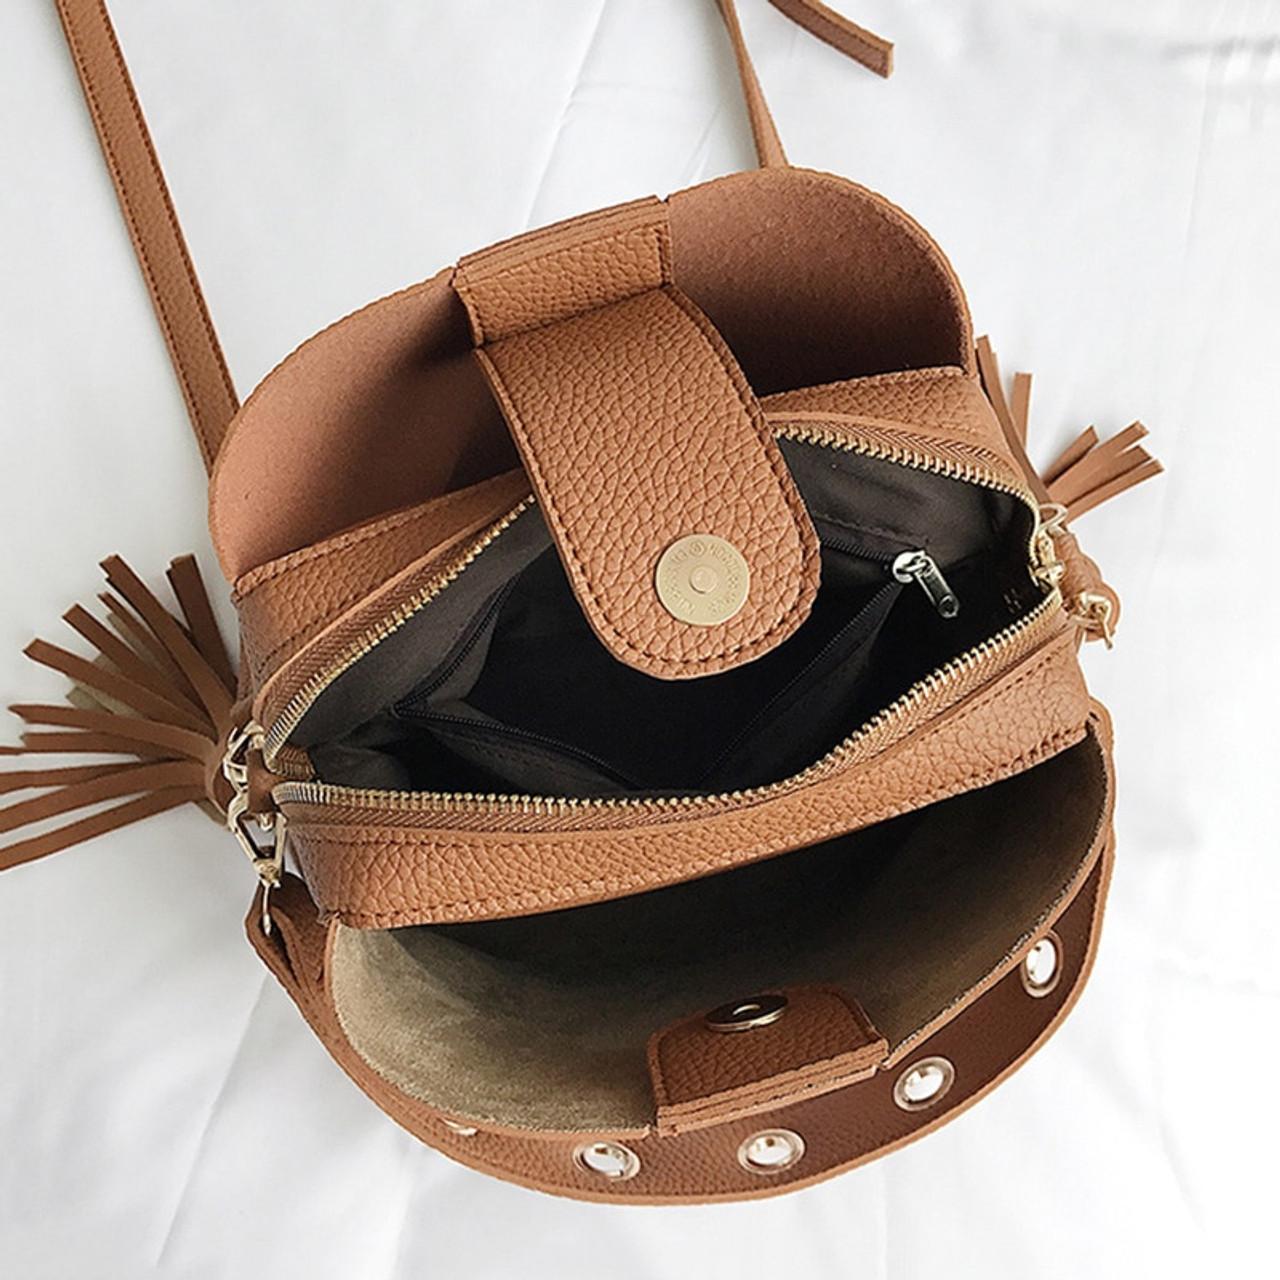 MARFUNY Brand Tassel Shoulder Bag Female Vintage Crossbody Bags For Women 2018